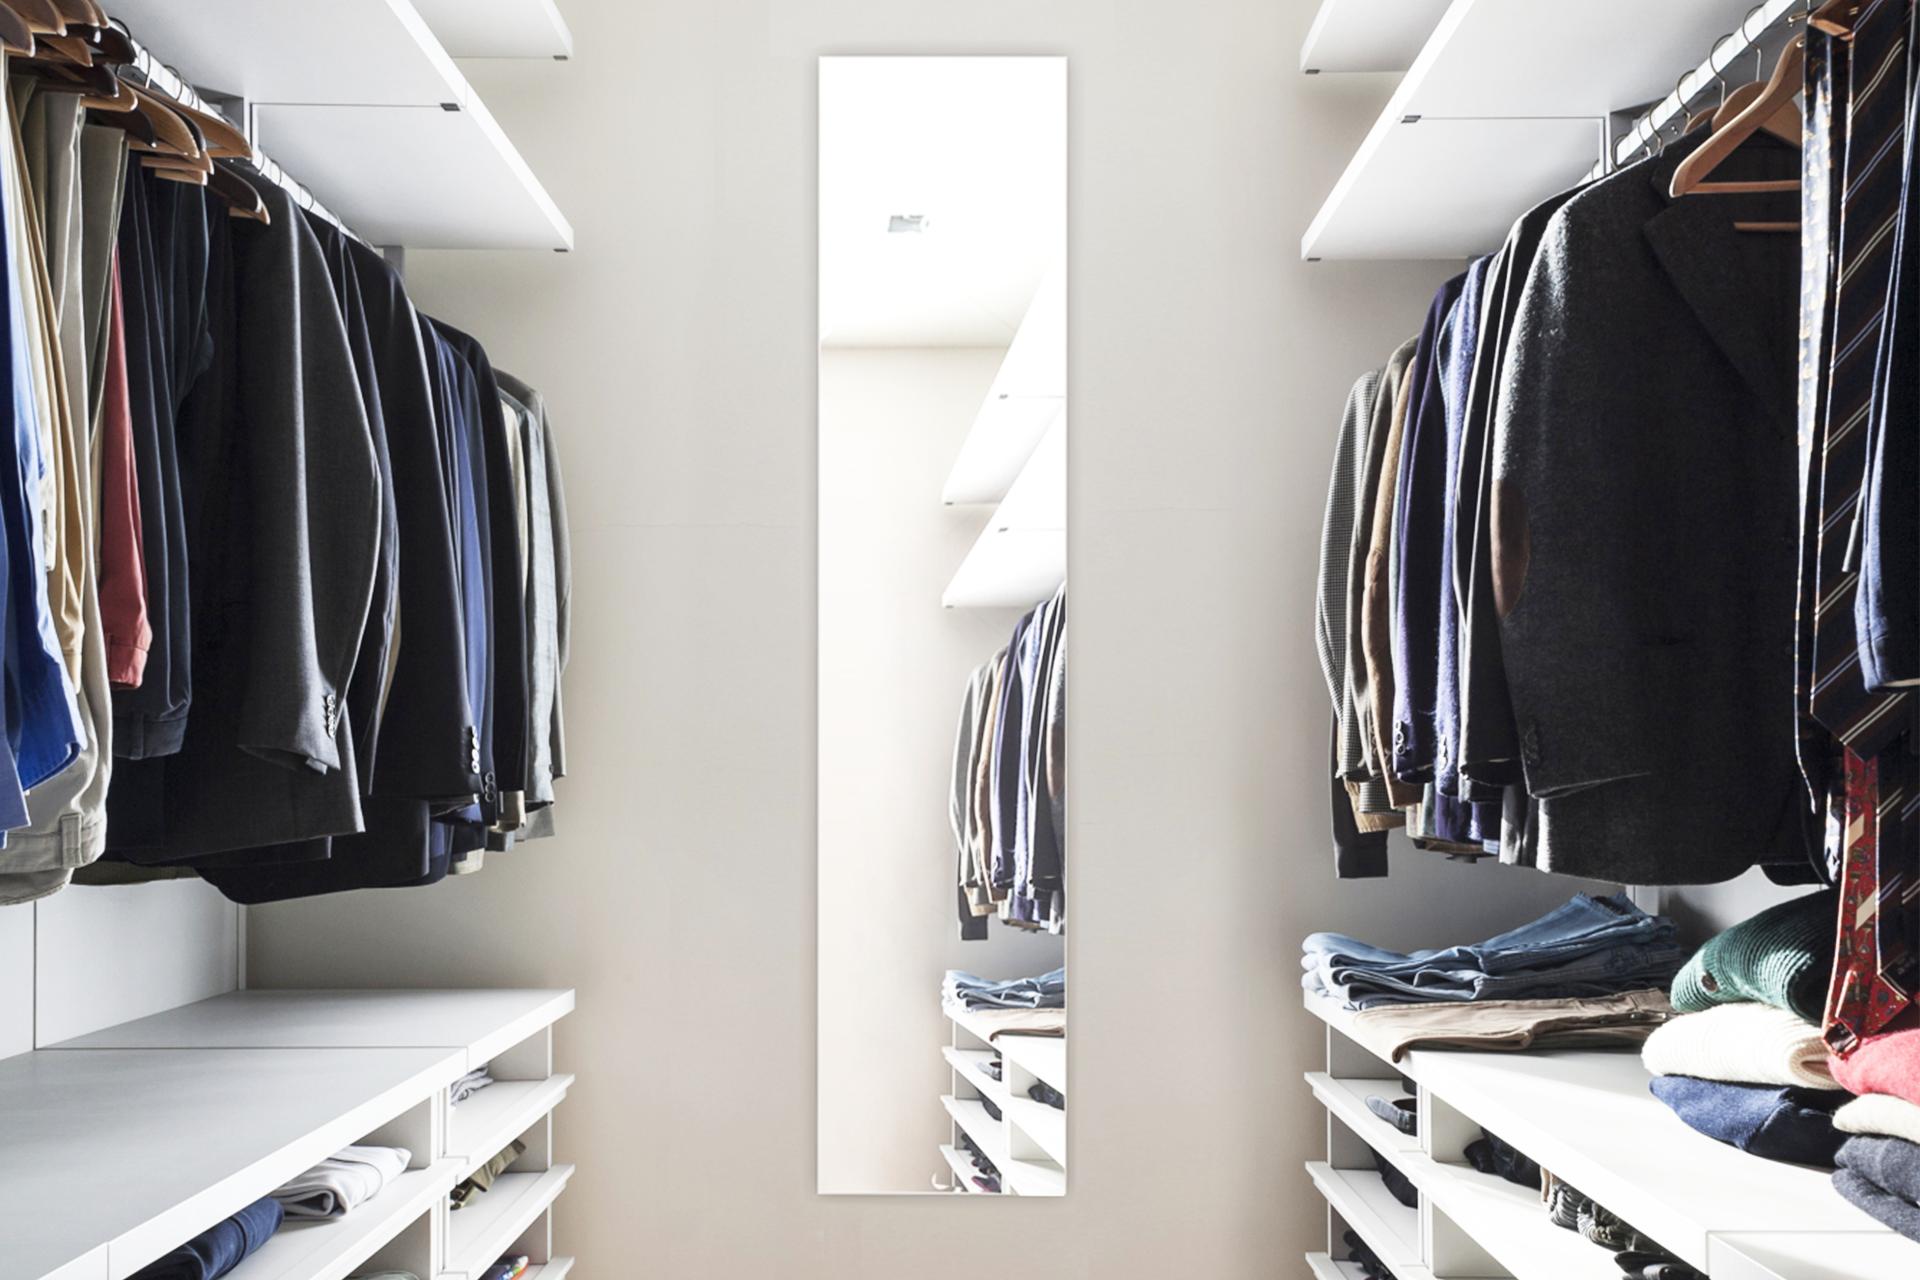 Tall Sidler Swiss Bathroom Mirrored Medicine Cabinets